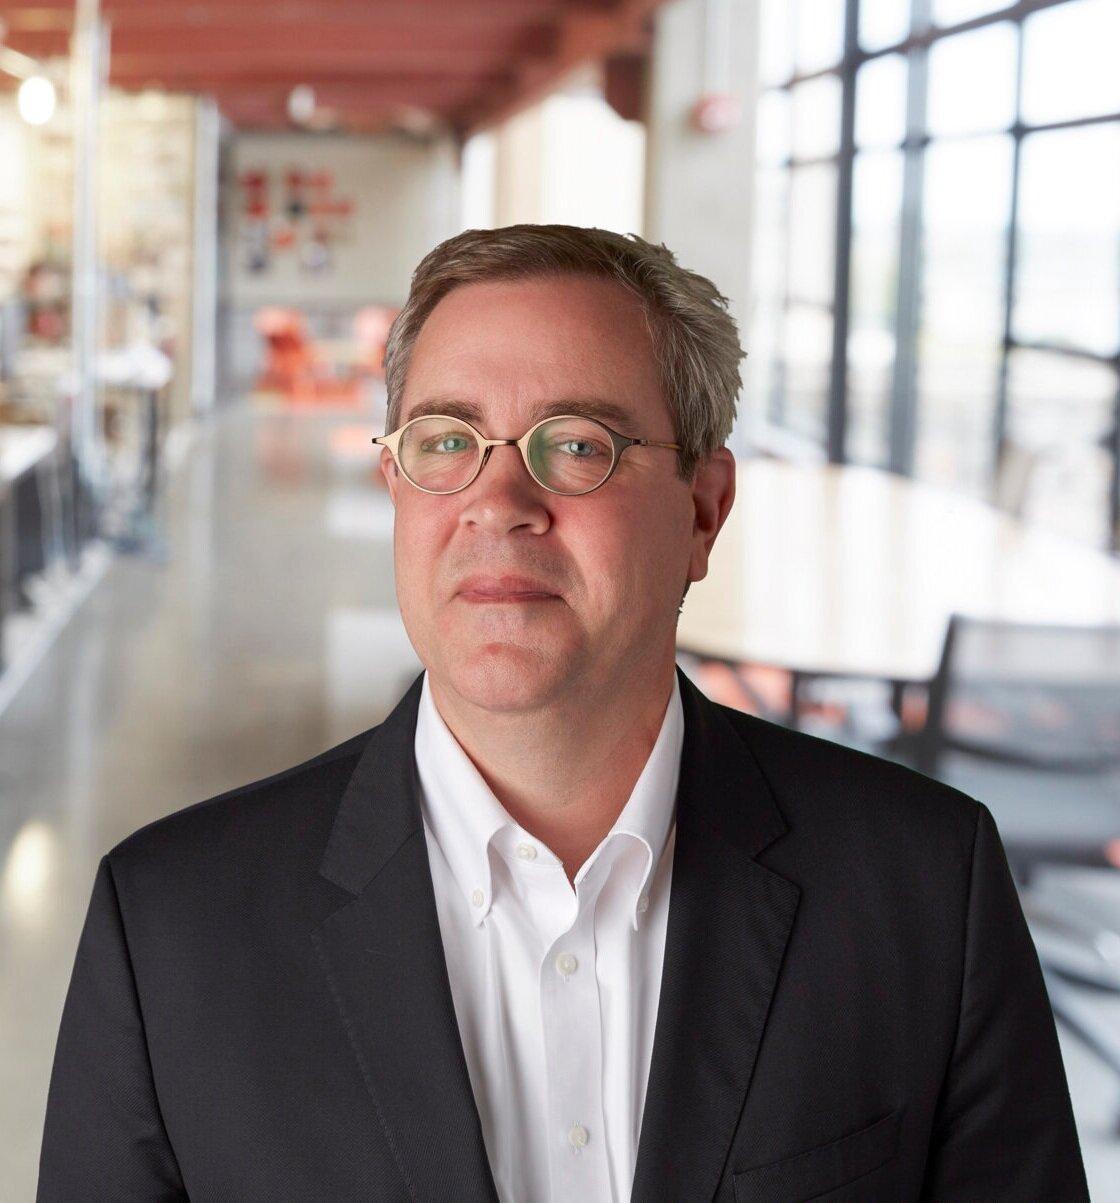 Paul Mellblom , Principal, MSR Design: